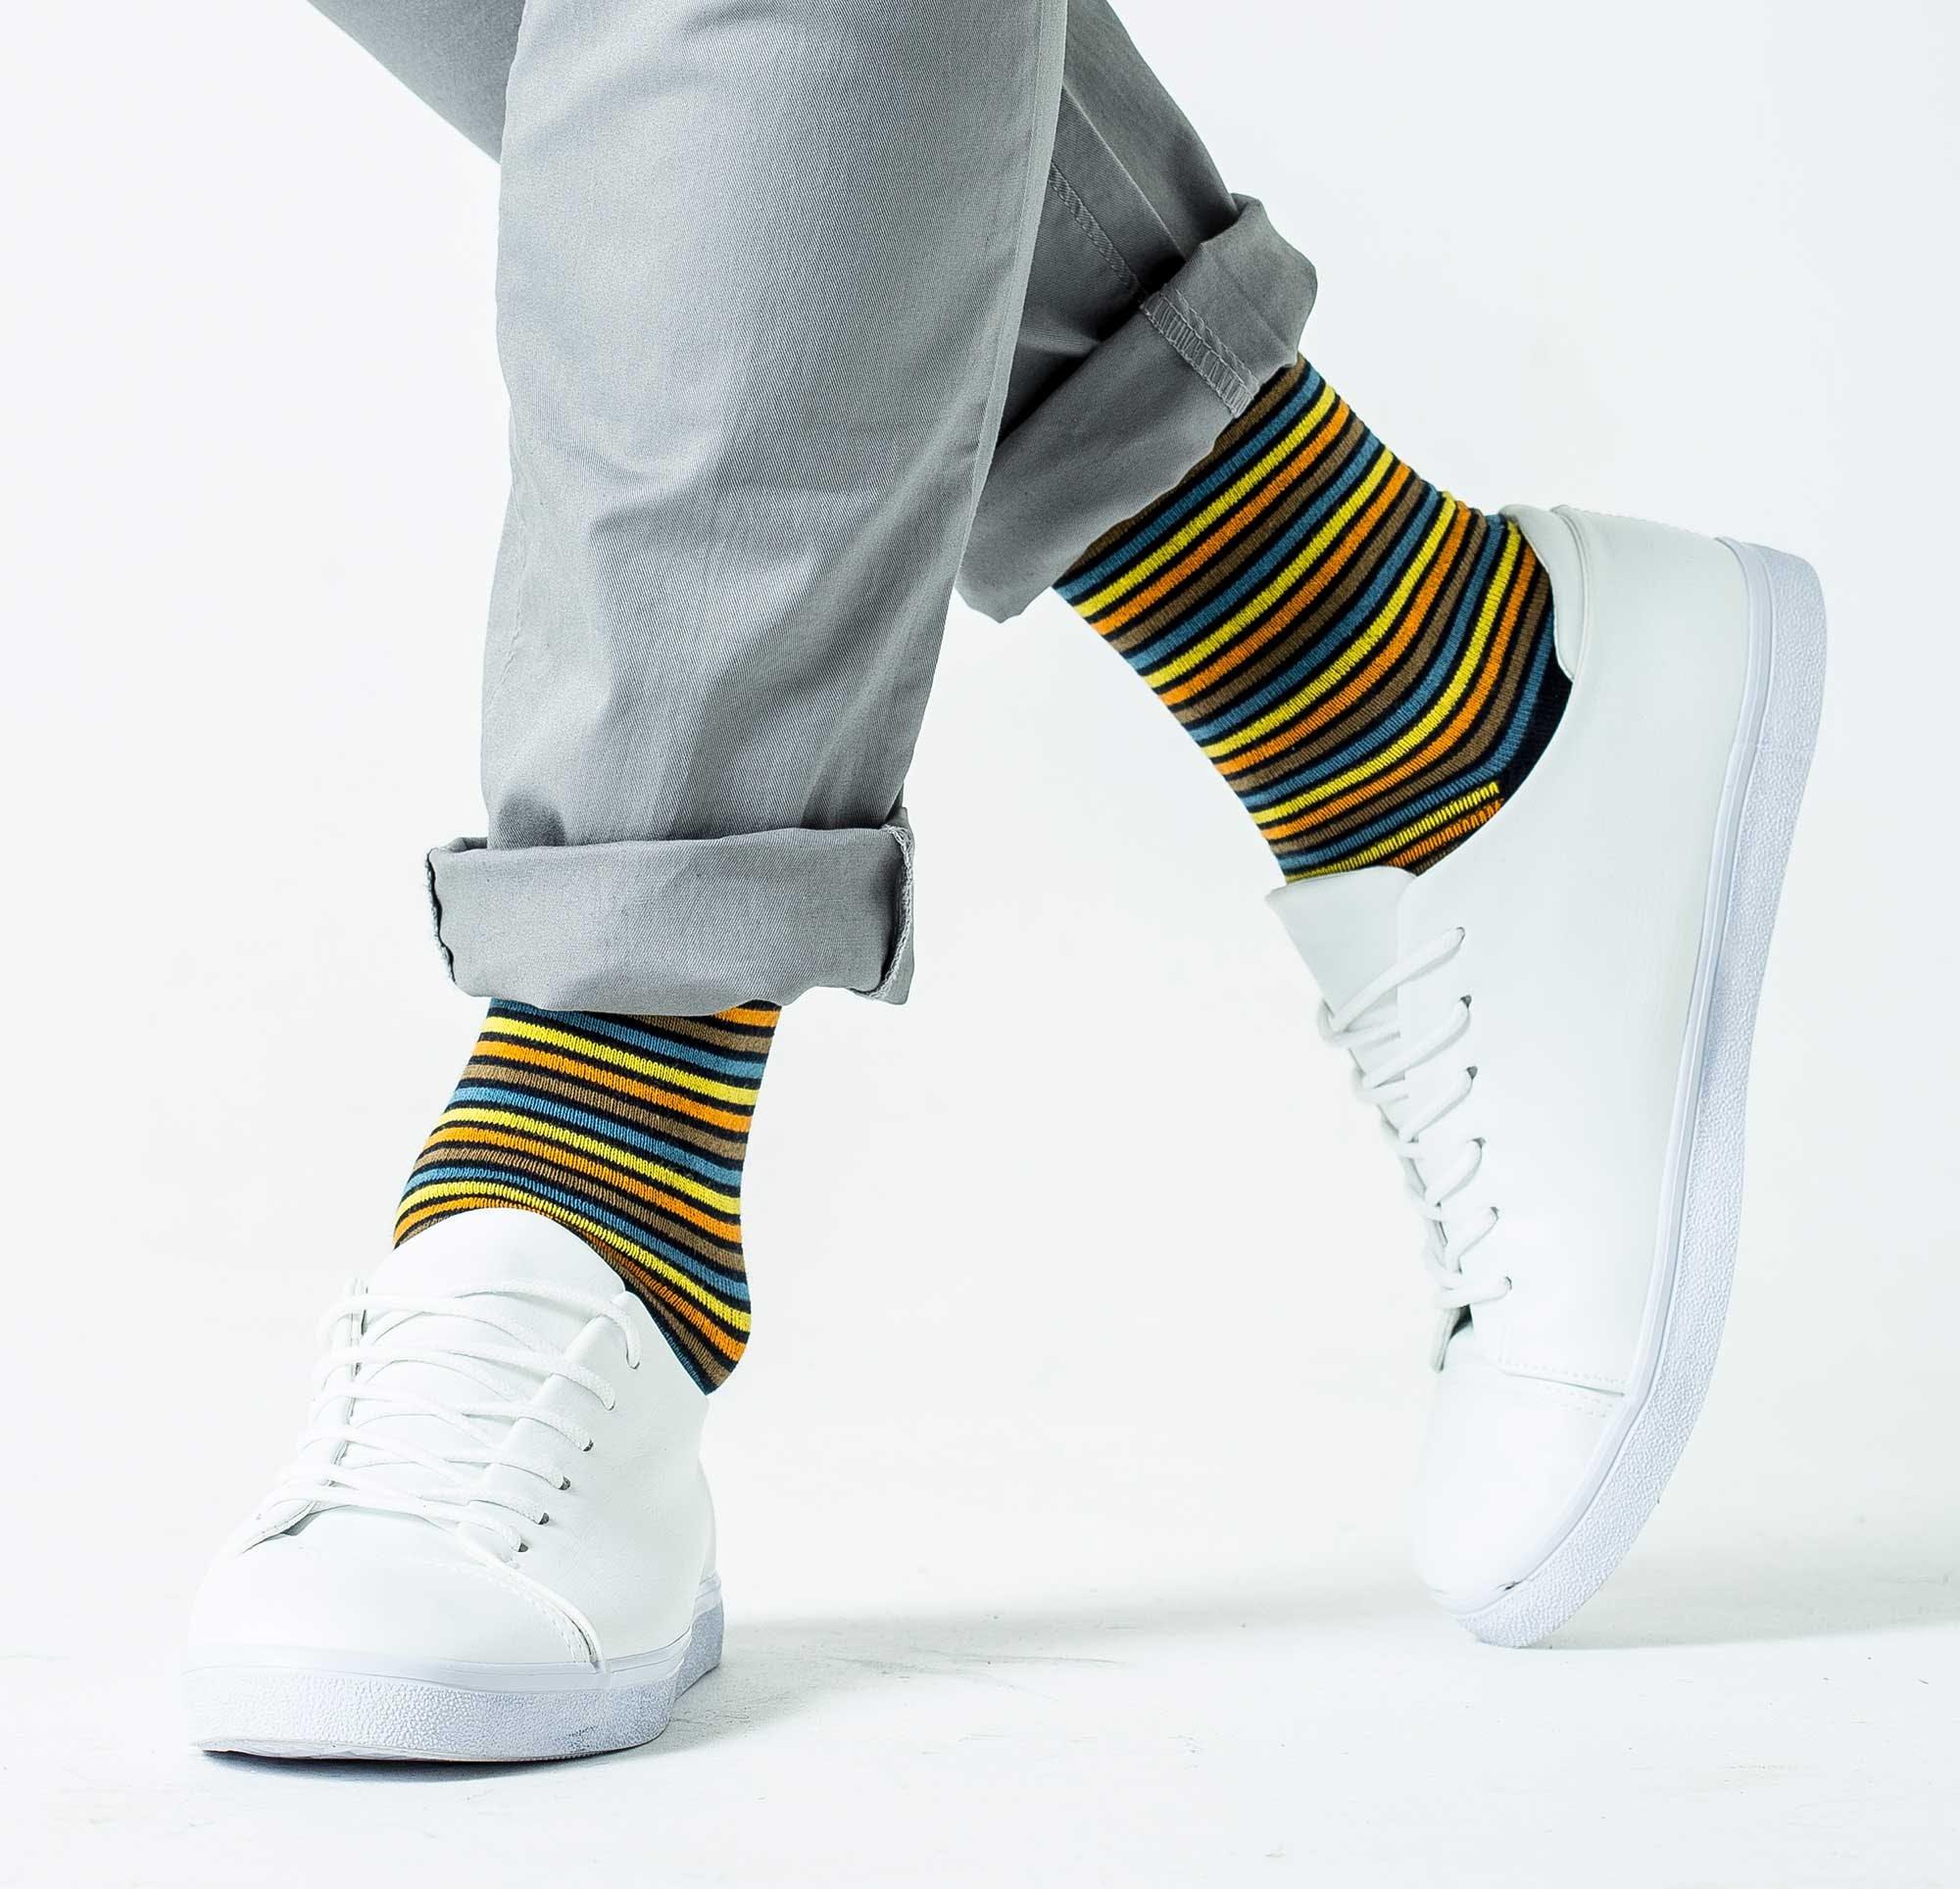 fashionable mens socks at a party